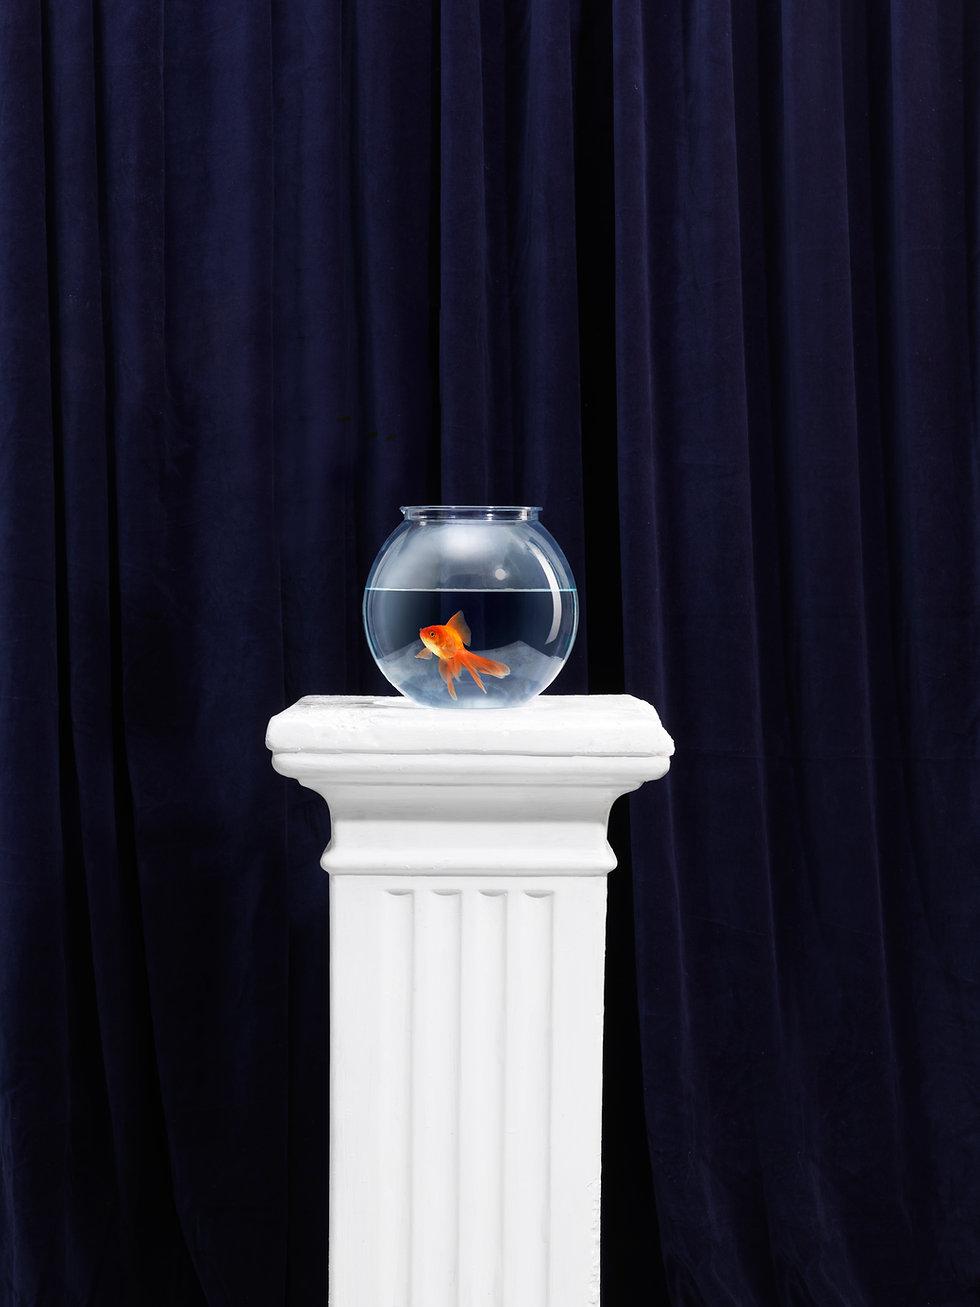 Aquarium with a goldfish on a pedestal